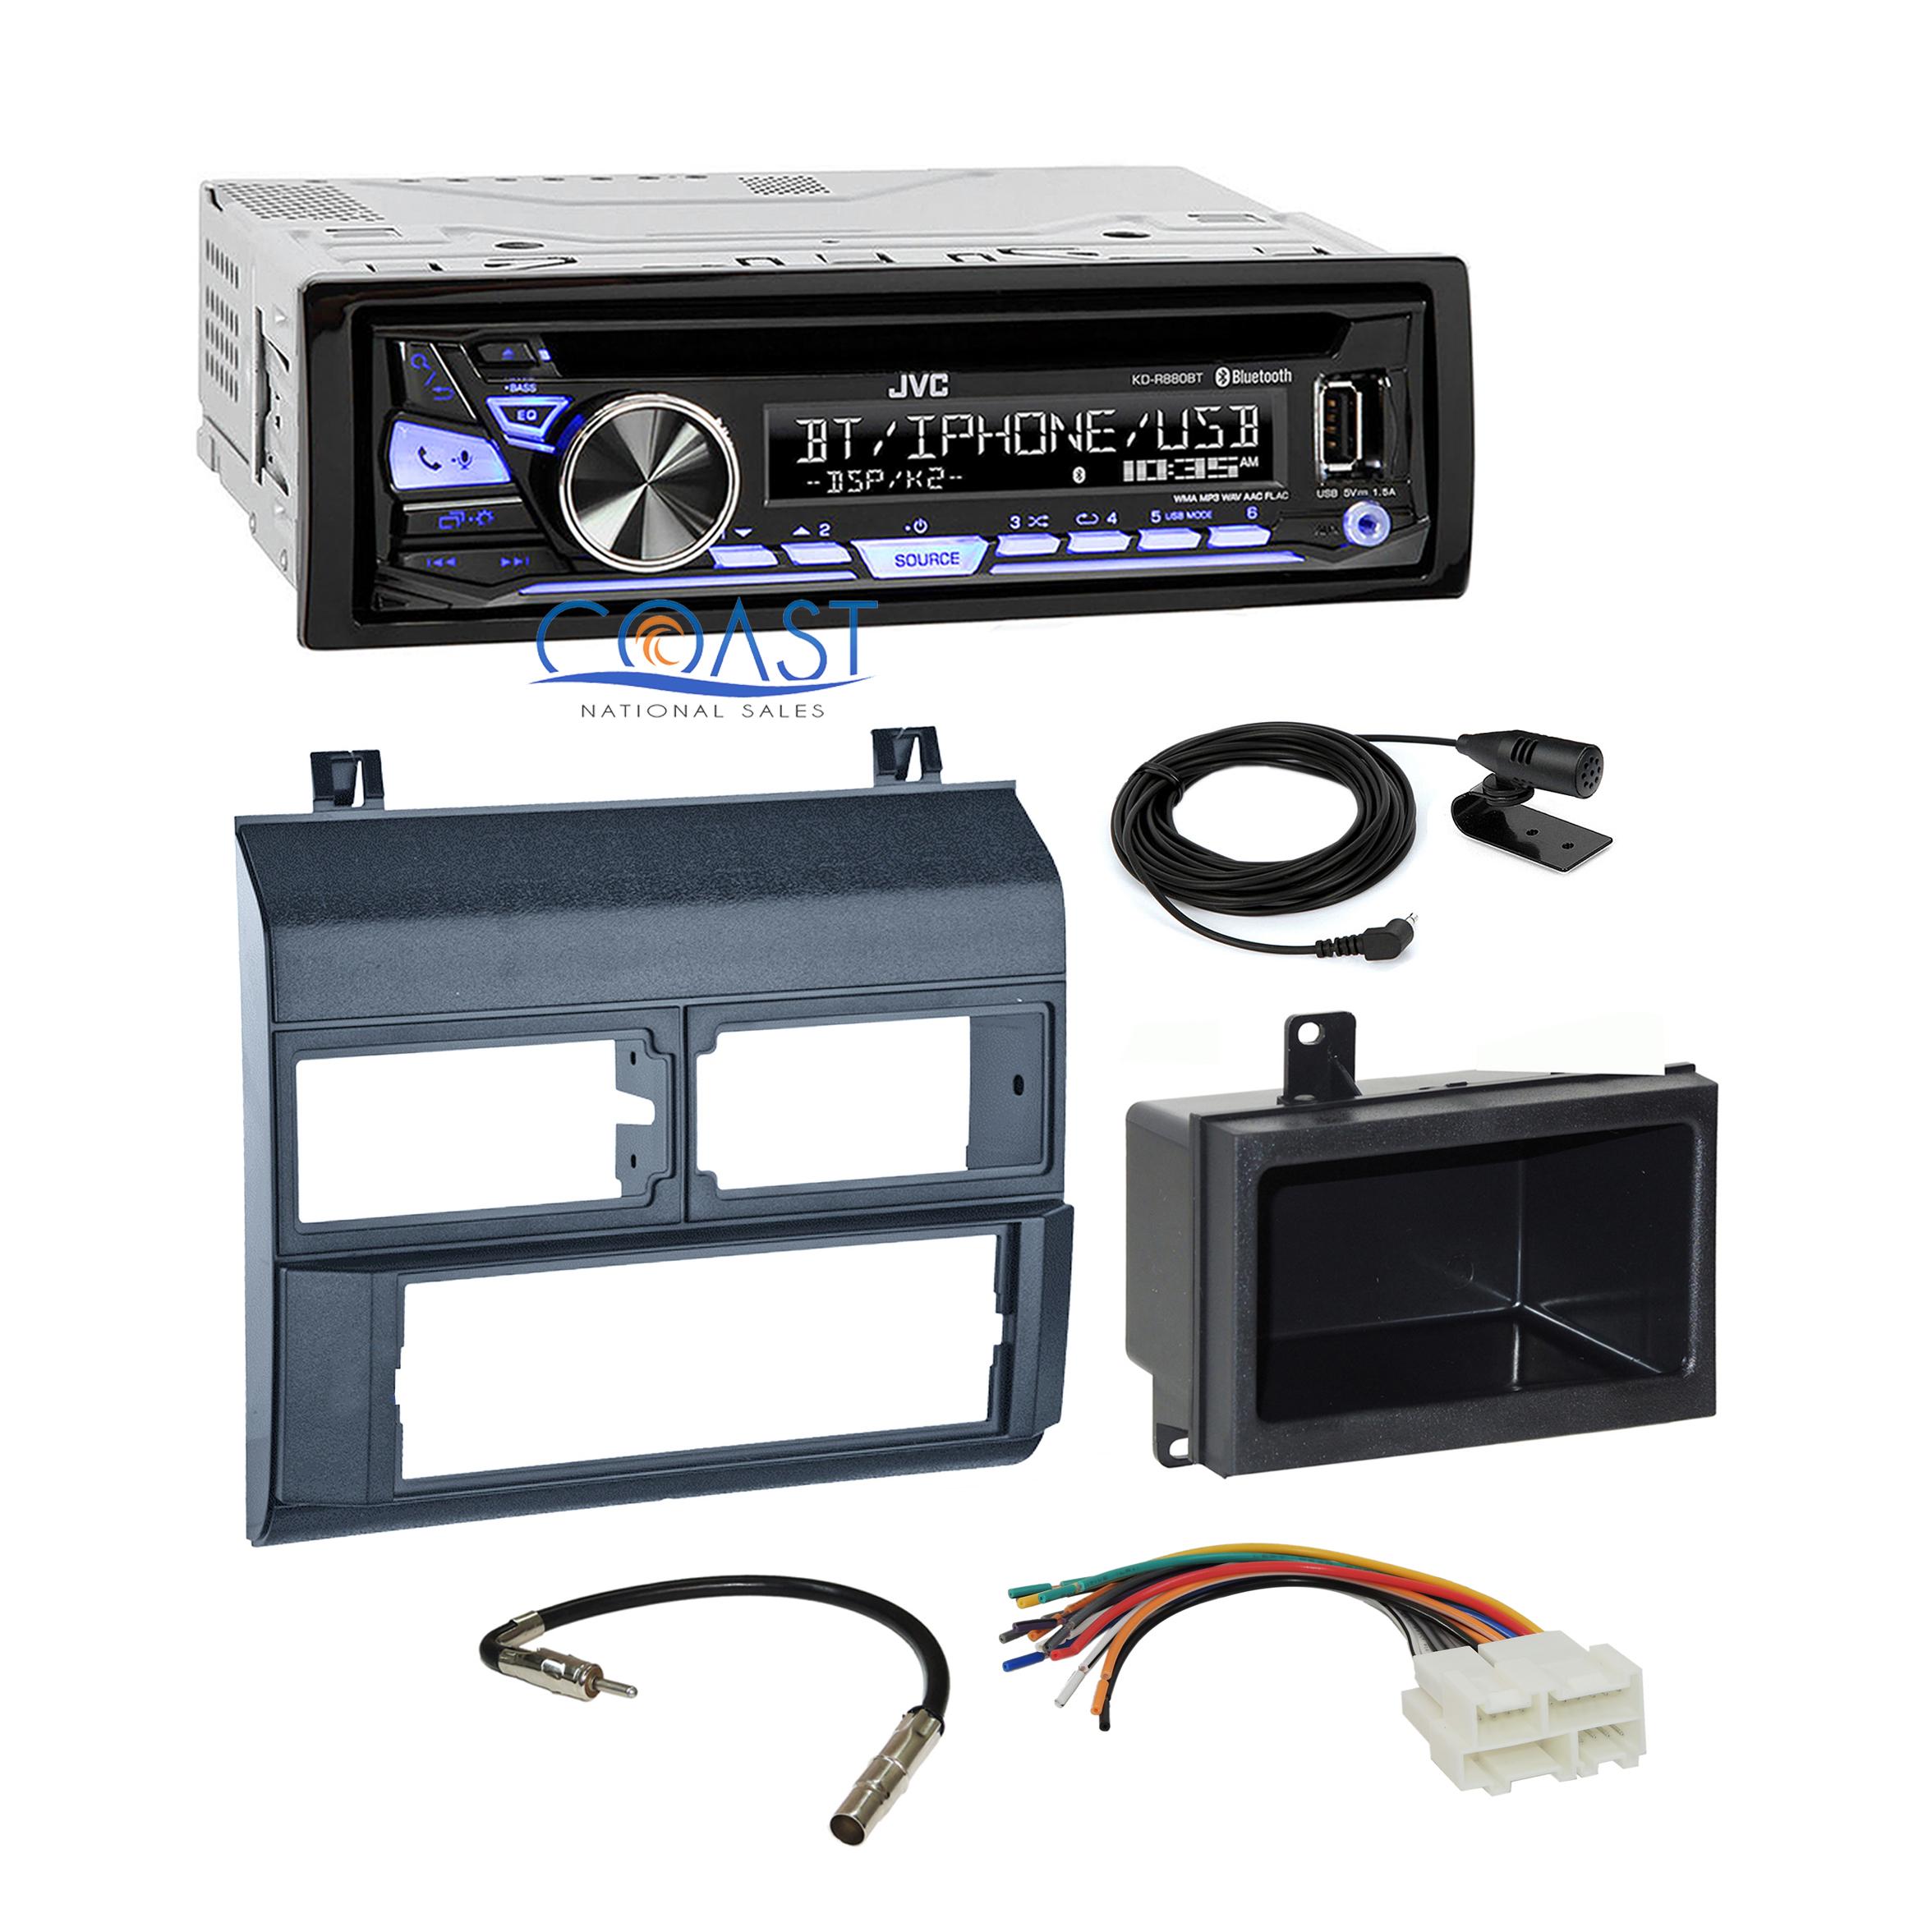 jvc bluetooth car stereo radio blue dash kit harness for. Black Bedroom Furniture Sets. Home Design Ideas